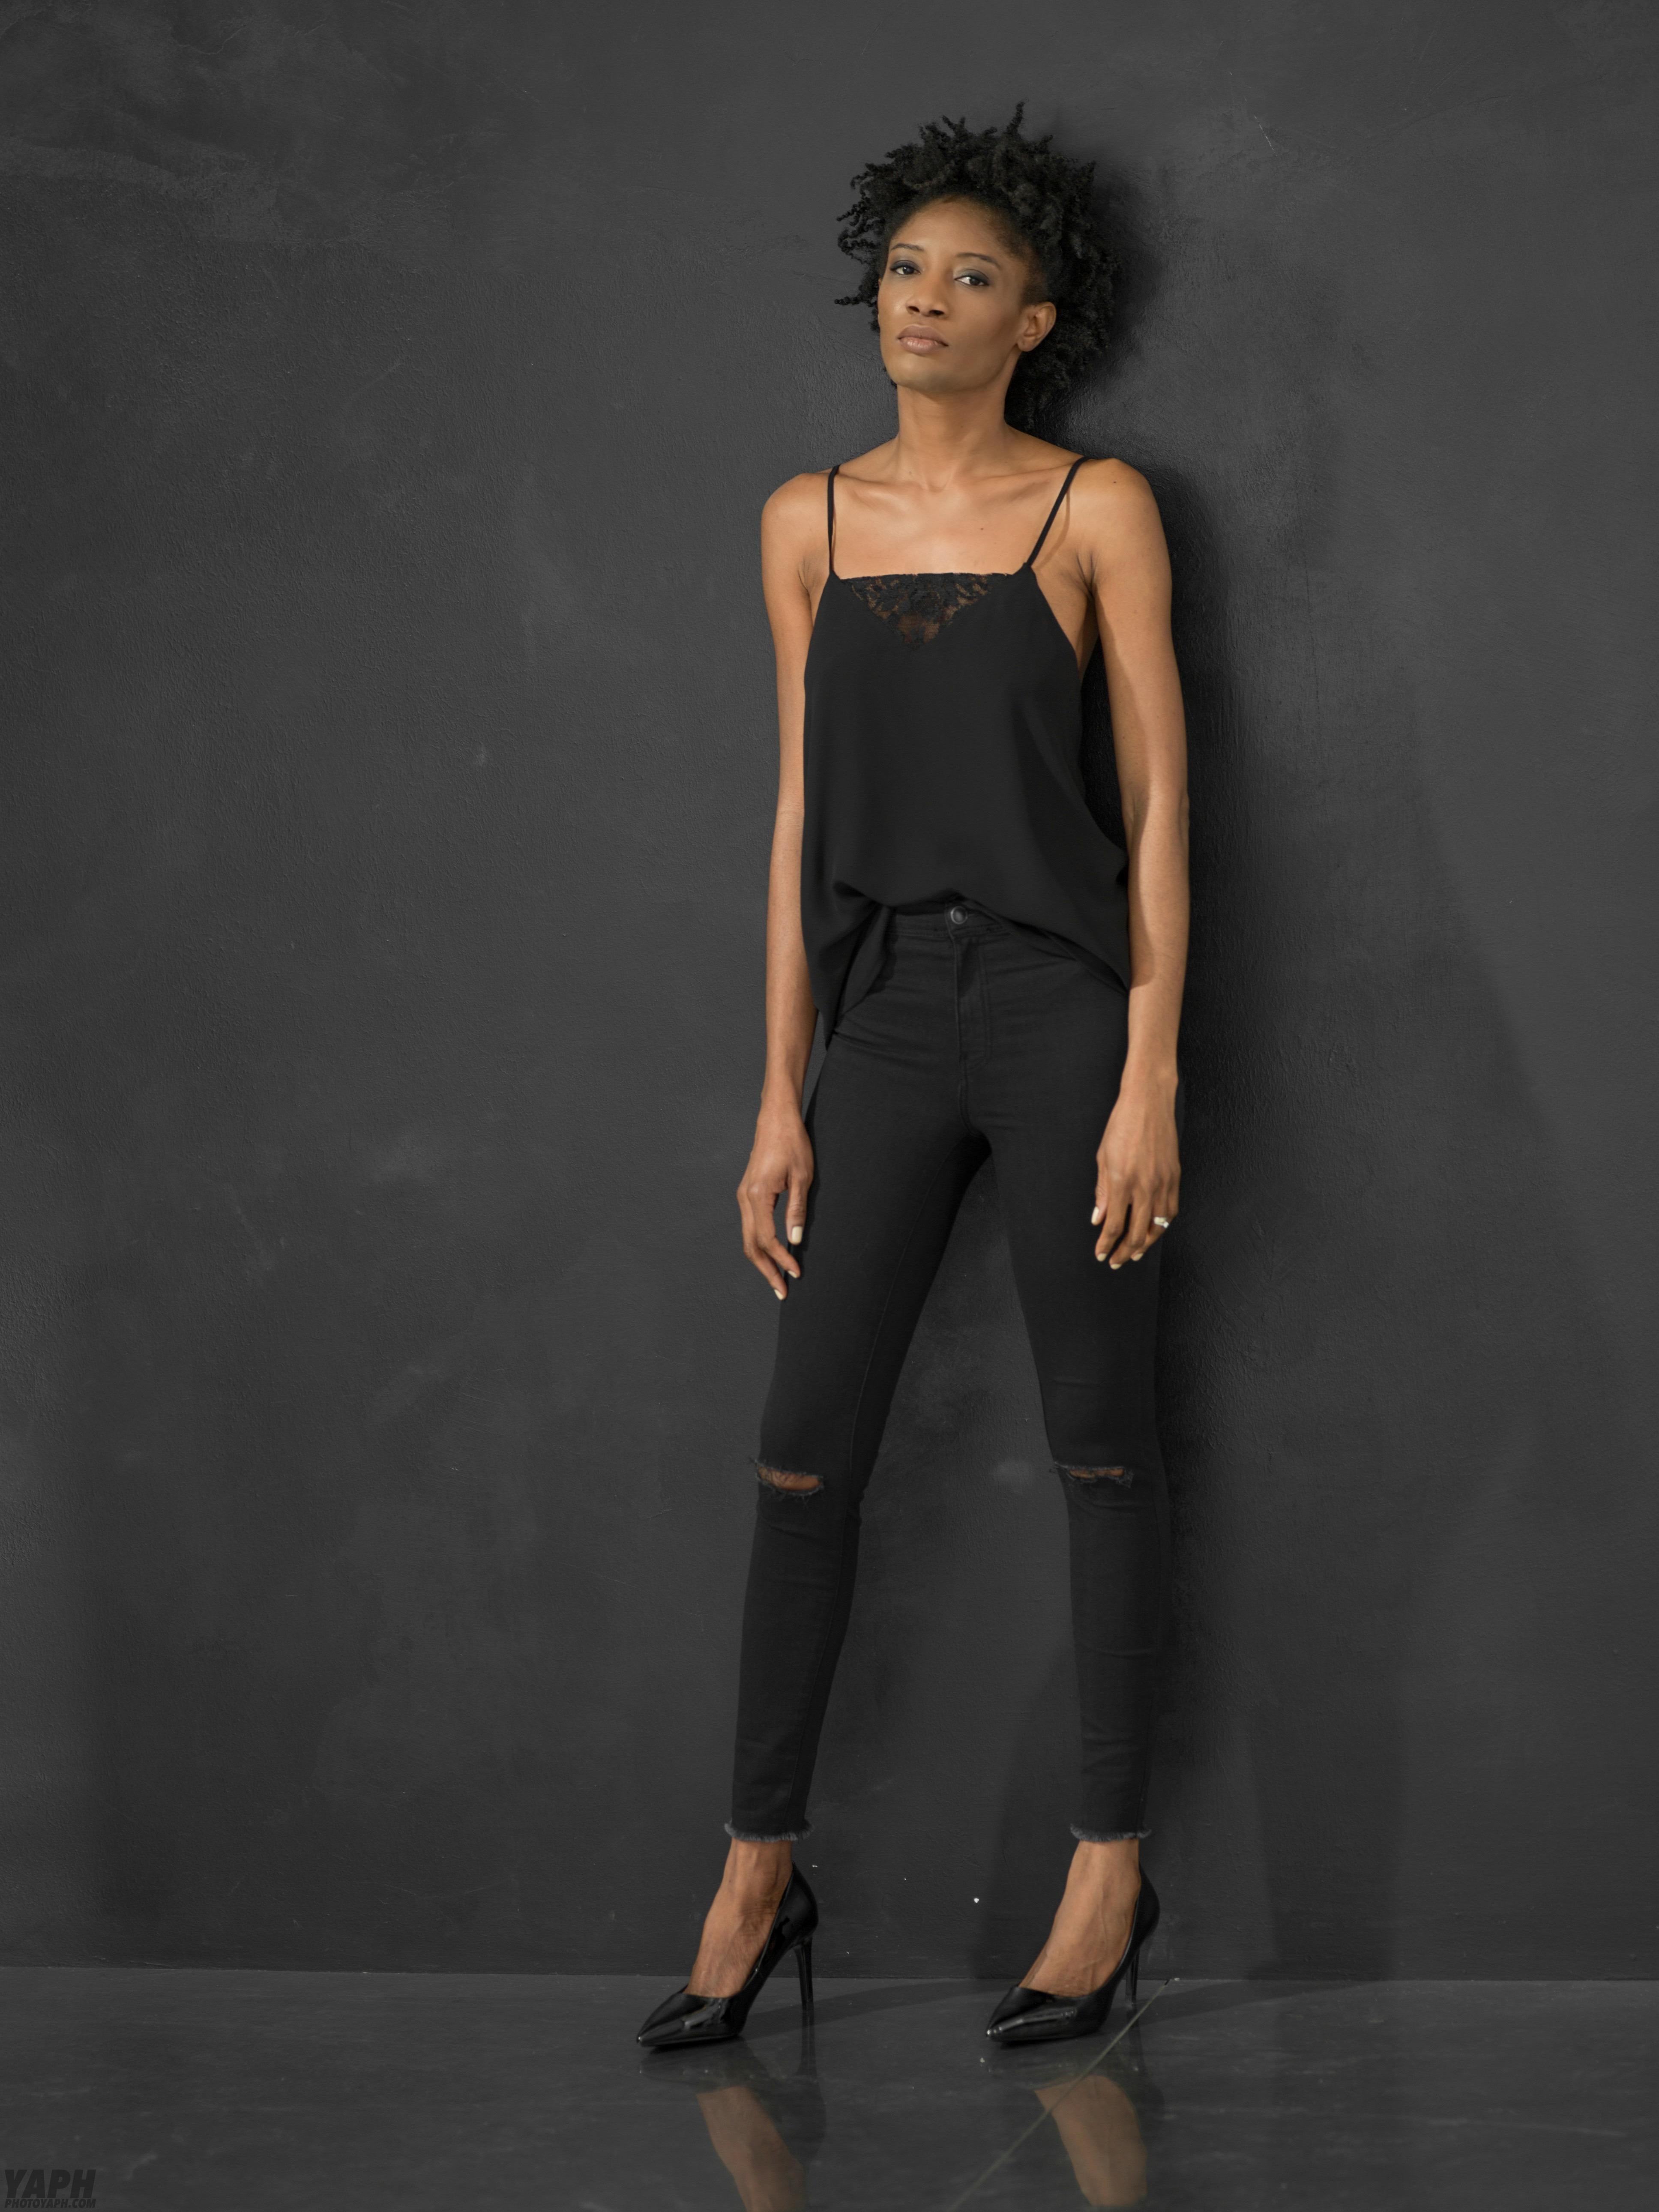 freelance model - Biba's Trend